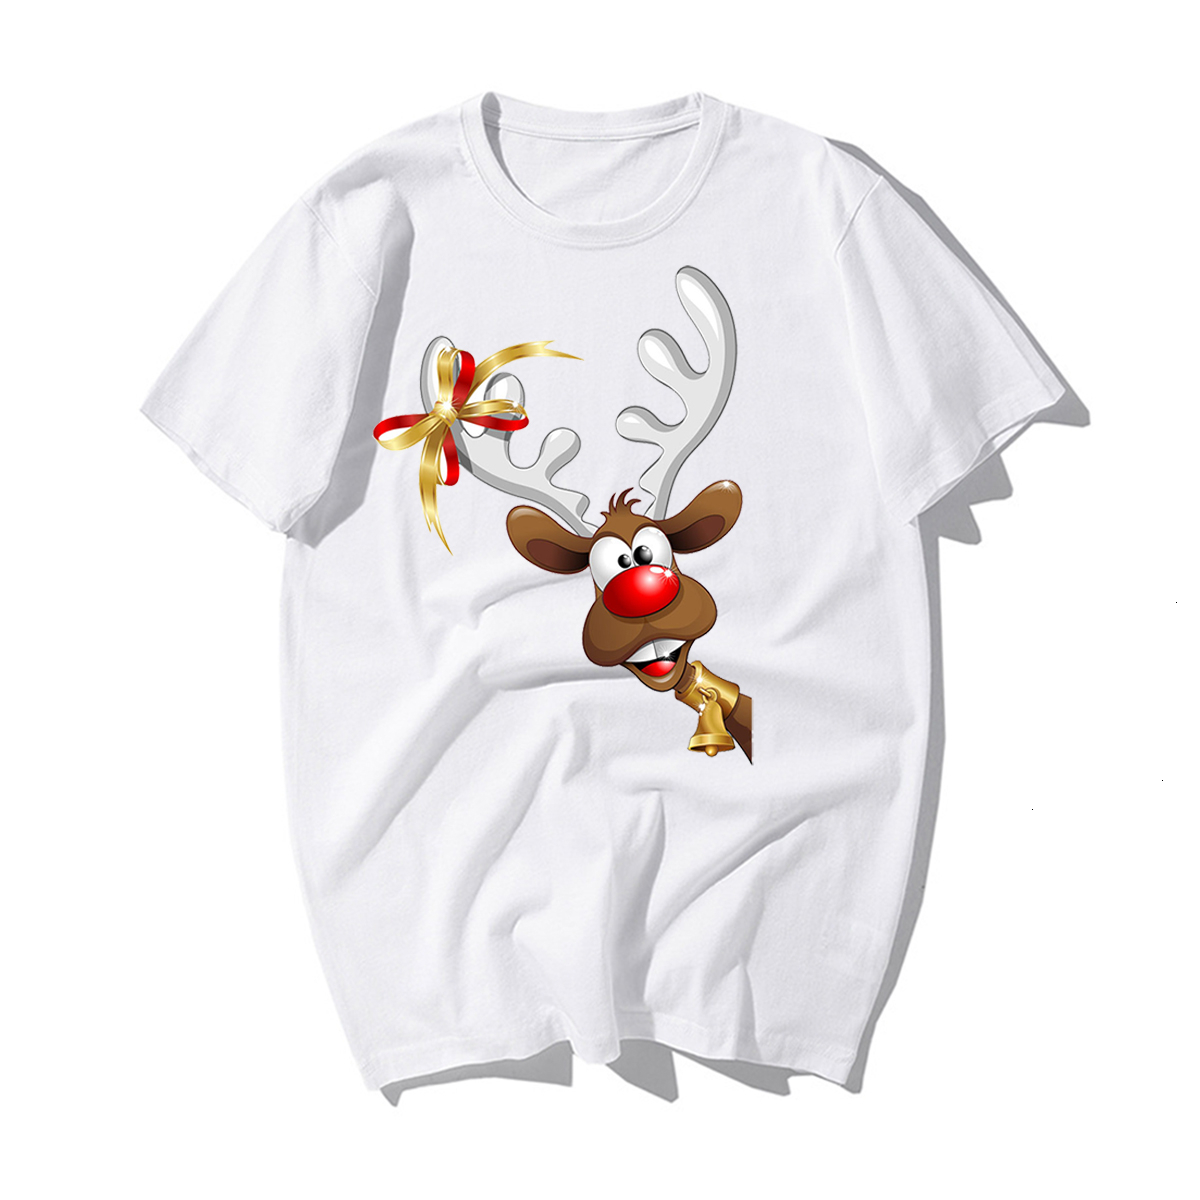 Funny Santa Claus Reindeer Lover CHRISTMAS GIFT T-SHIRT Happy New Year T Shirt Man Tshirt Merry CHRISTMAS Casual Cotton Kawaii 9